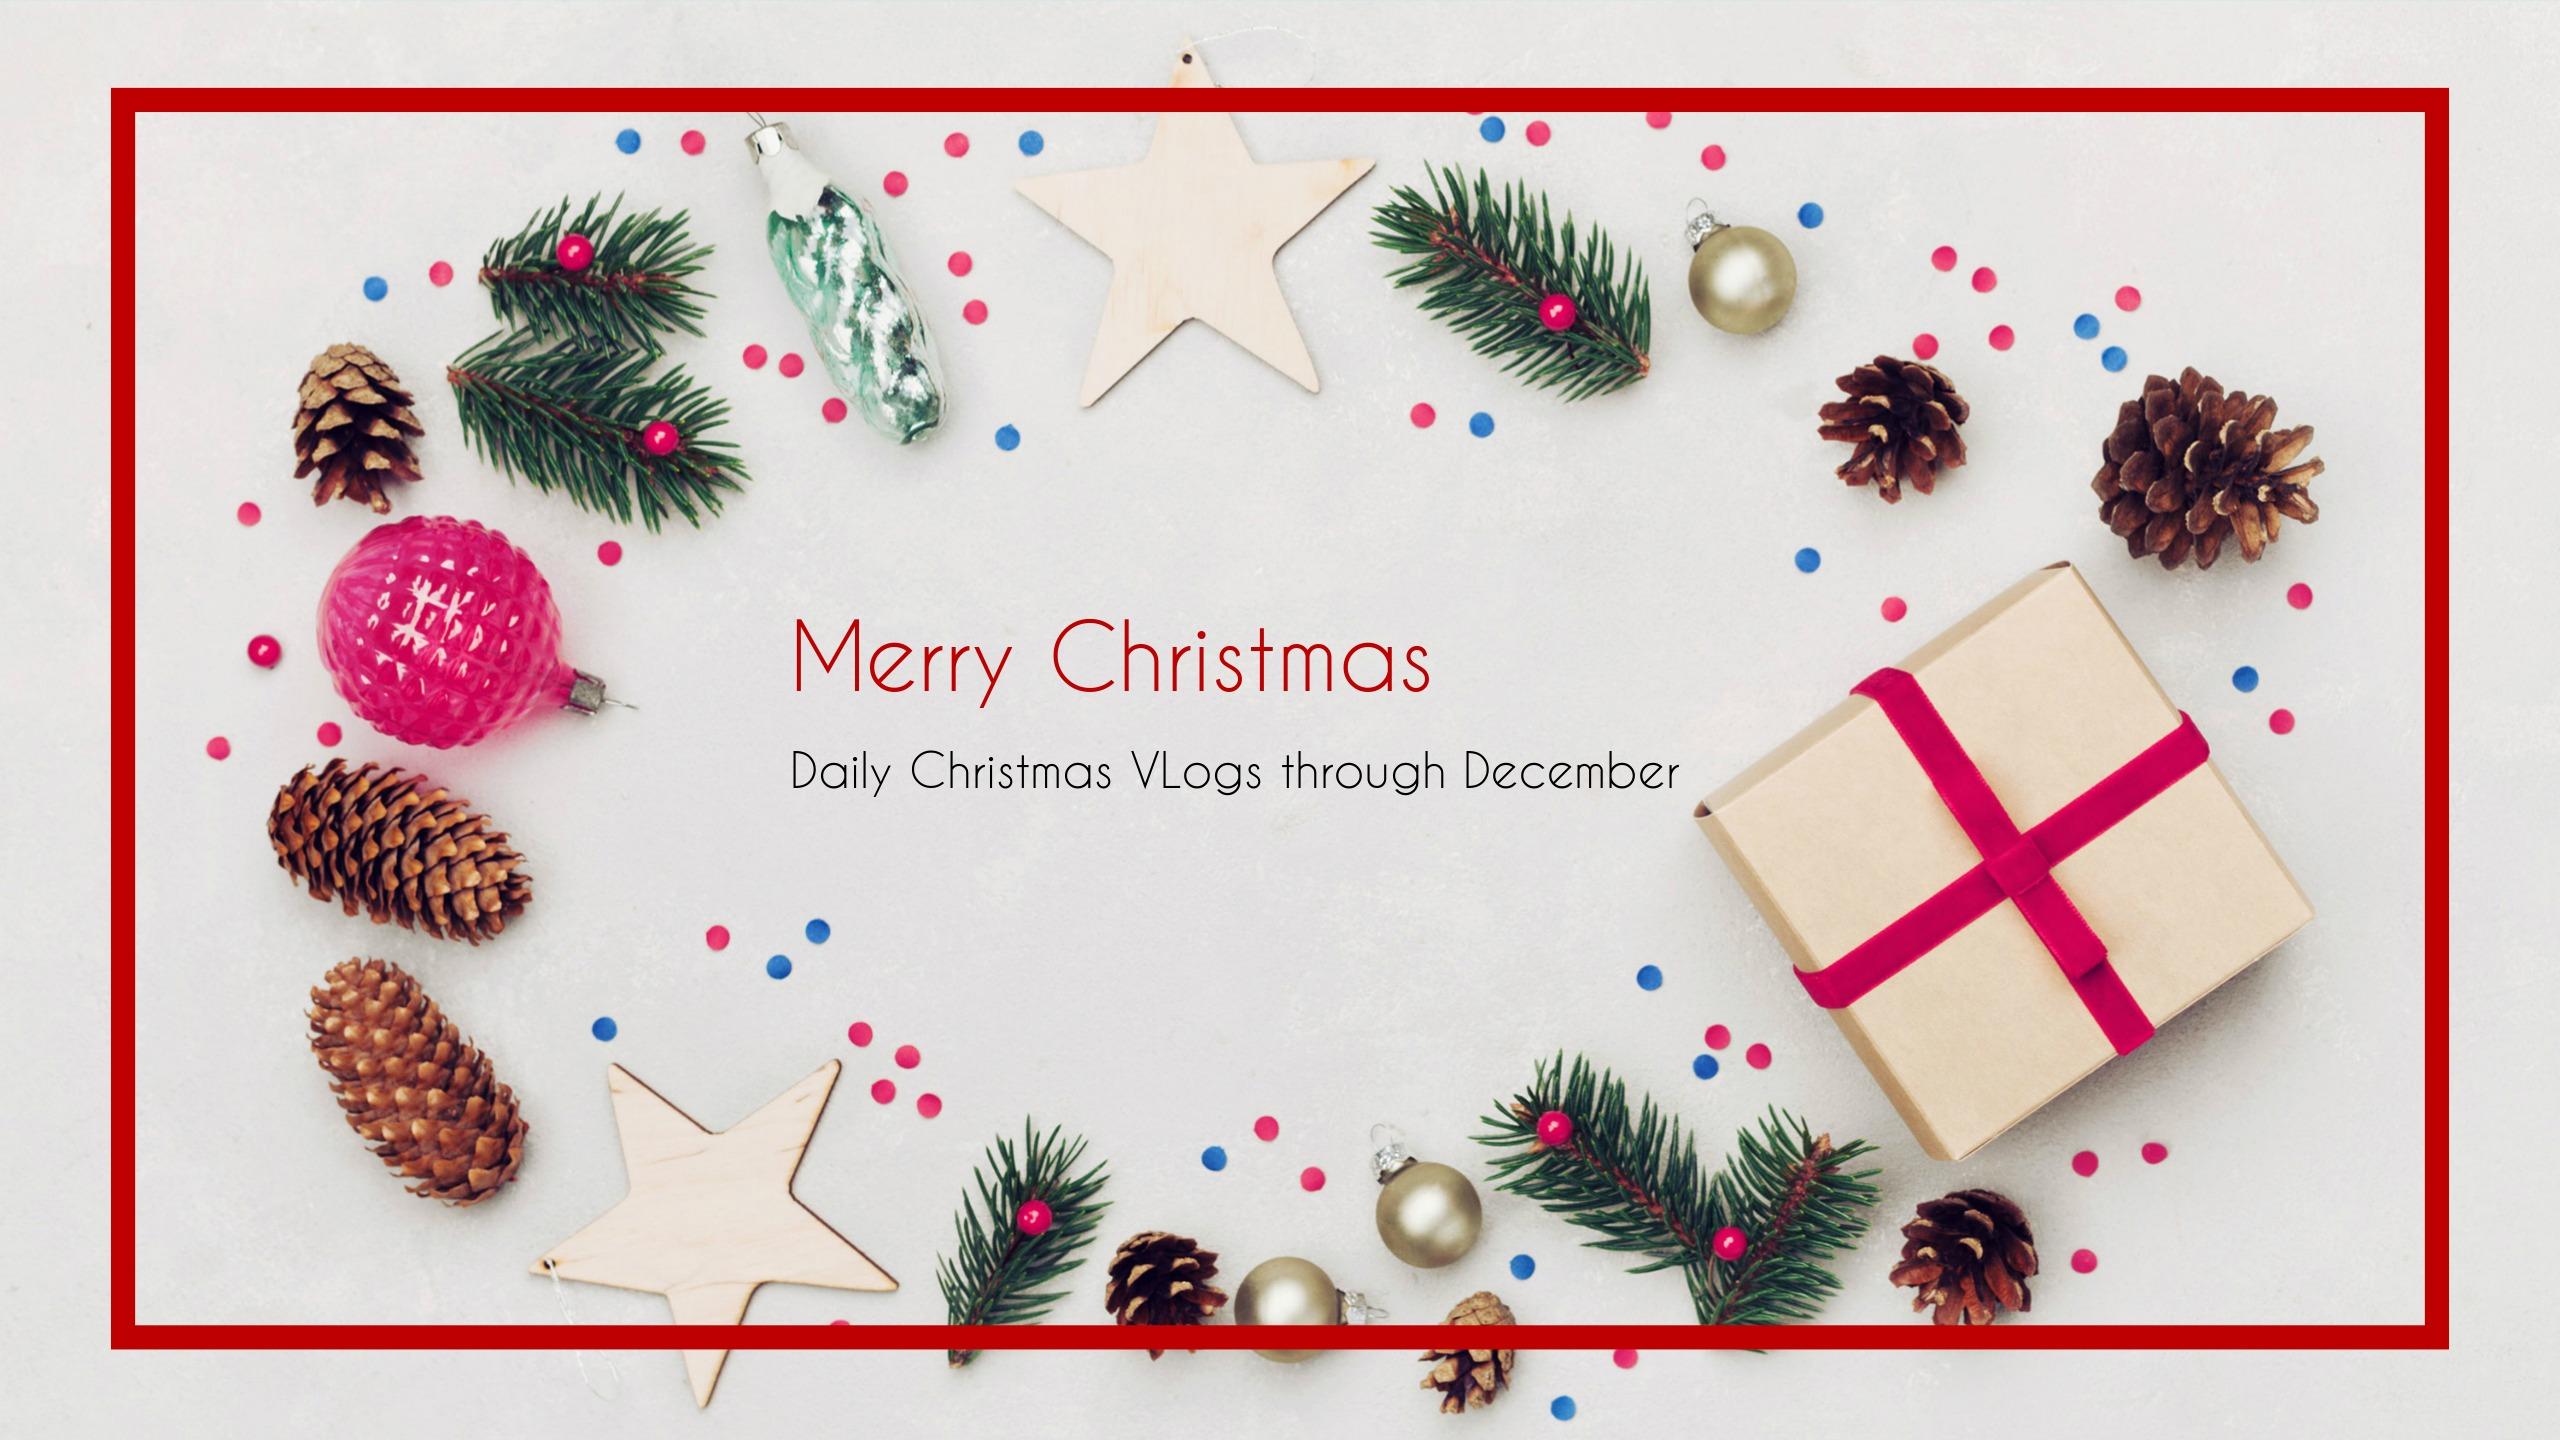 Present Merry Christmas